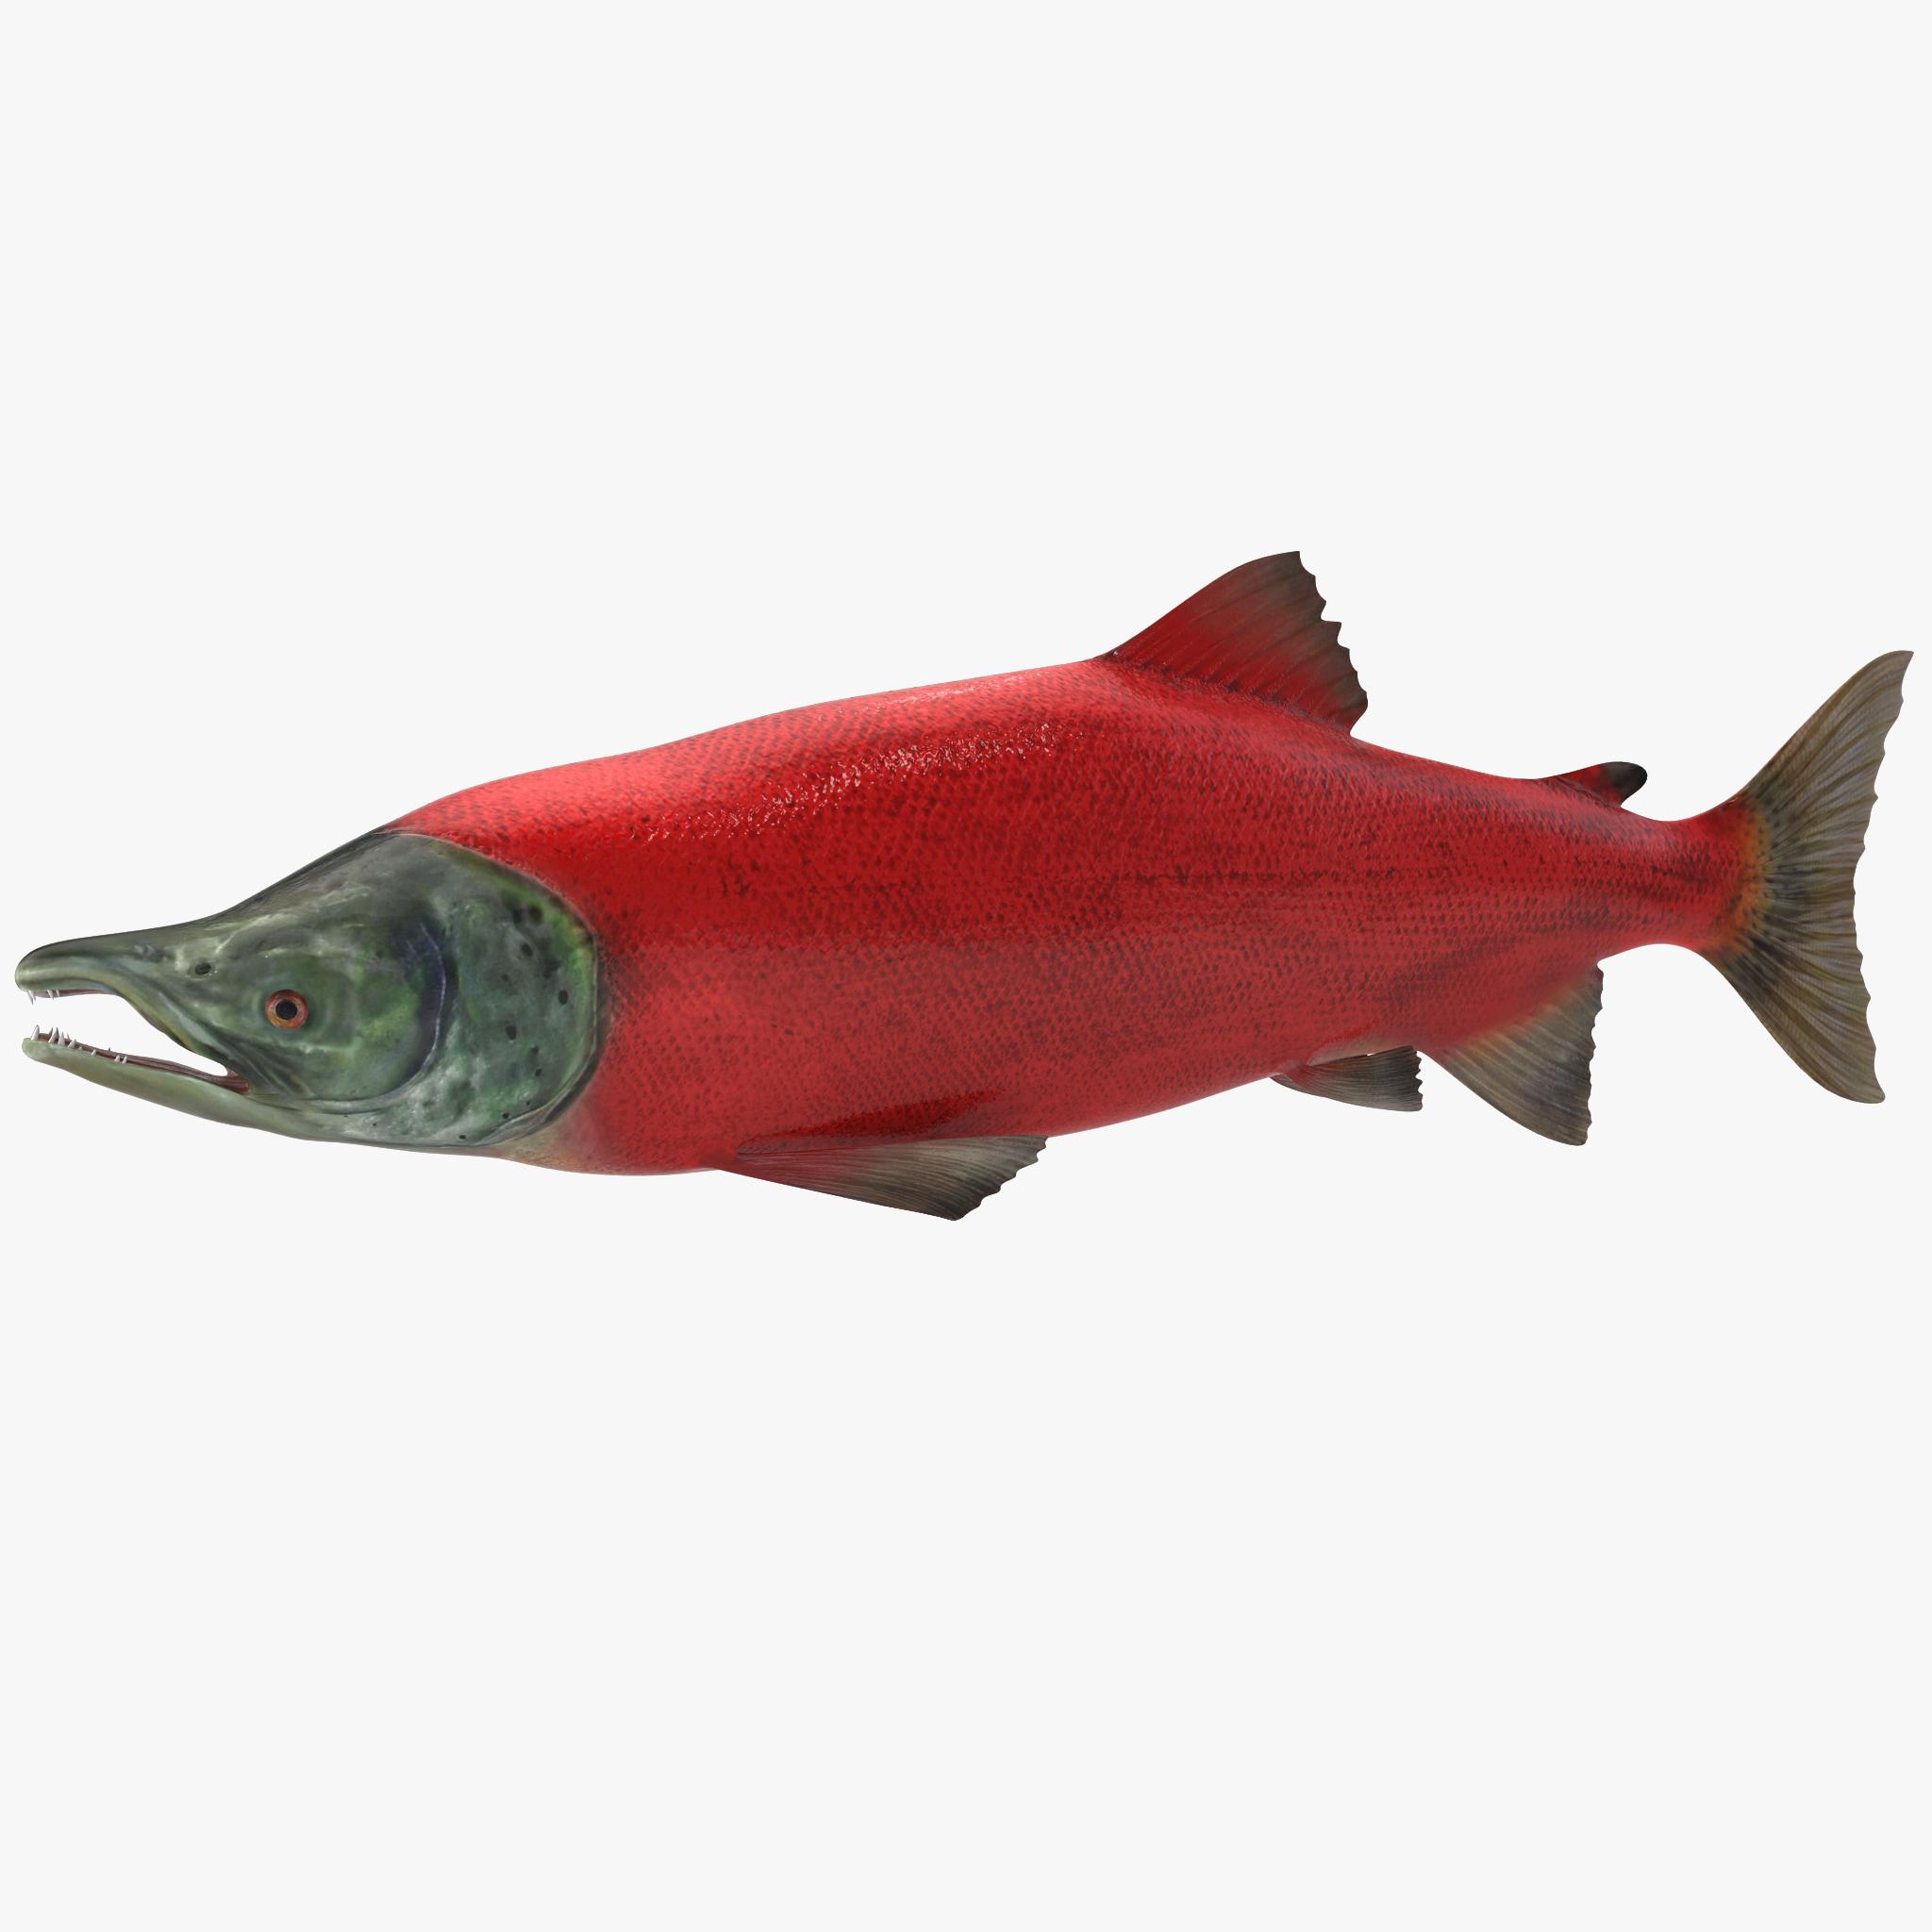 Red salmon fish - photo#39